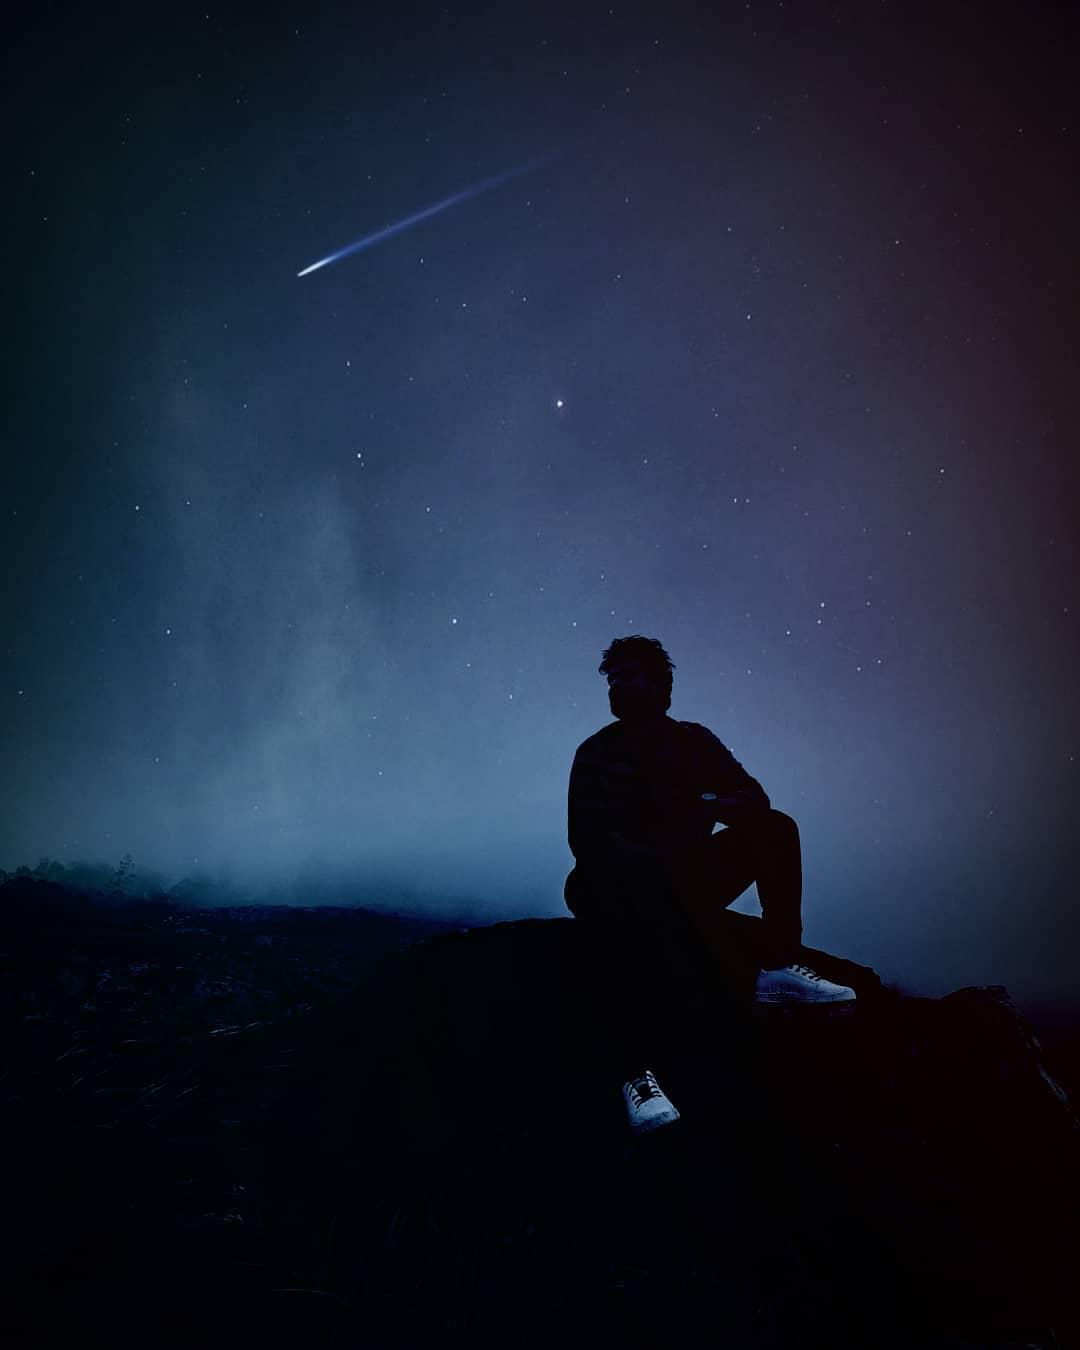 Shooting star make a wish